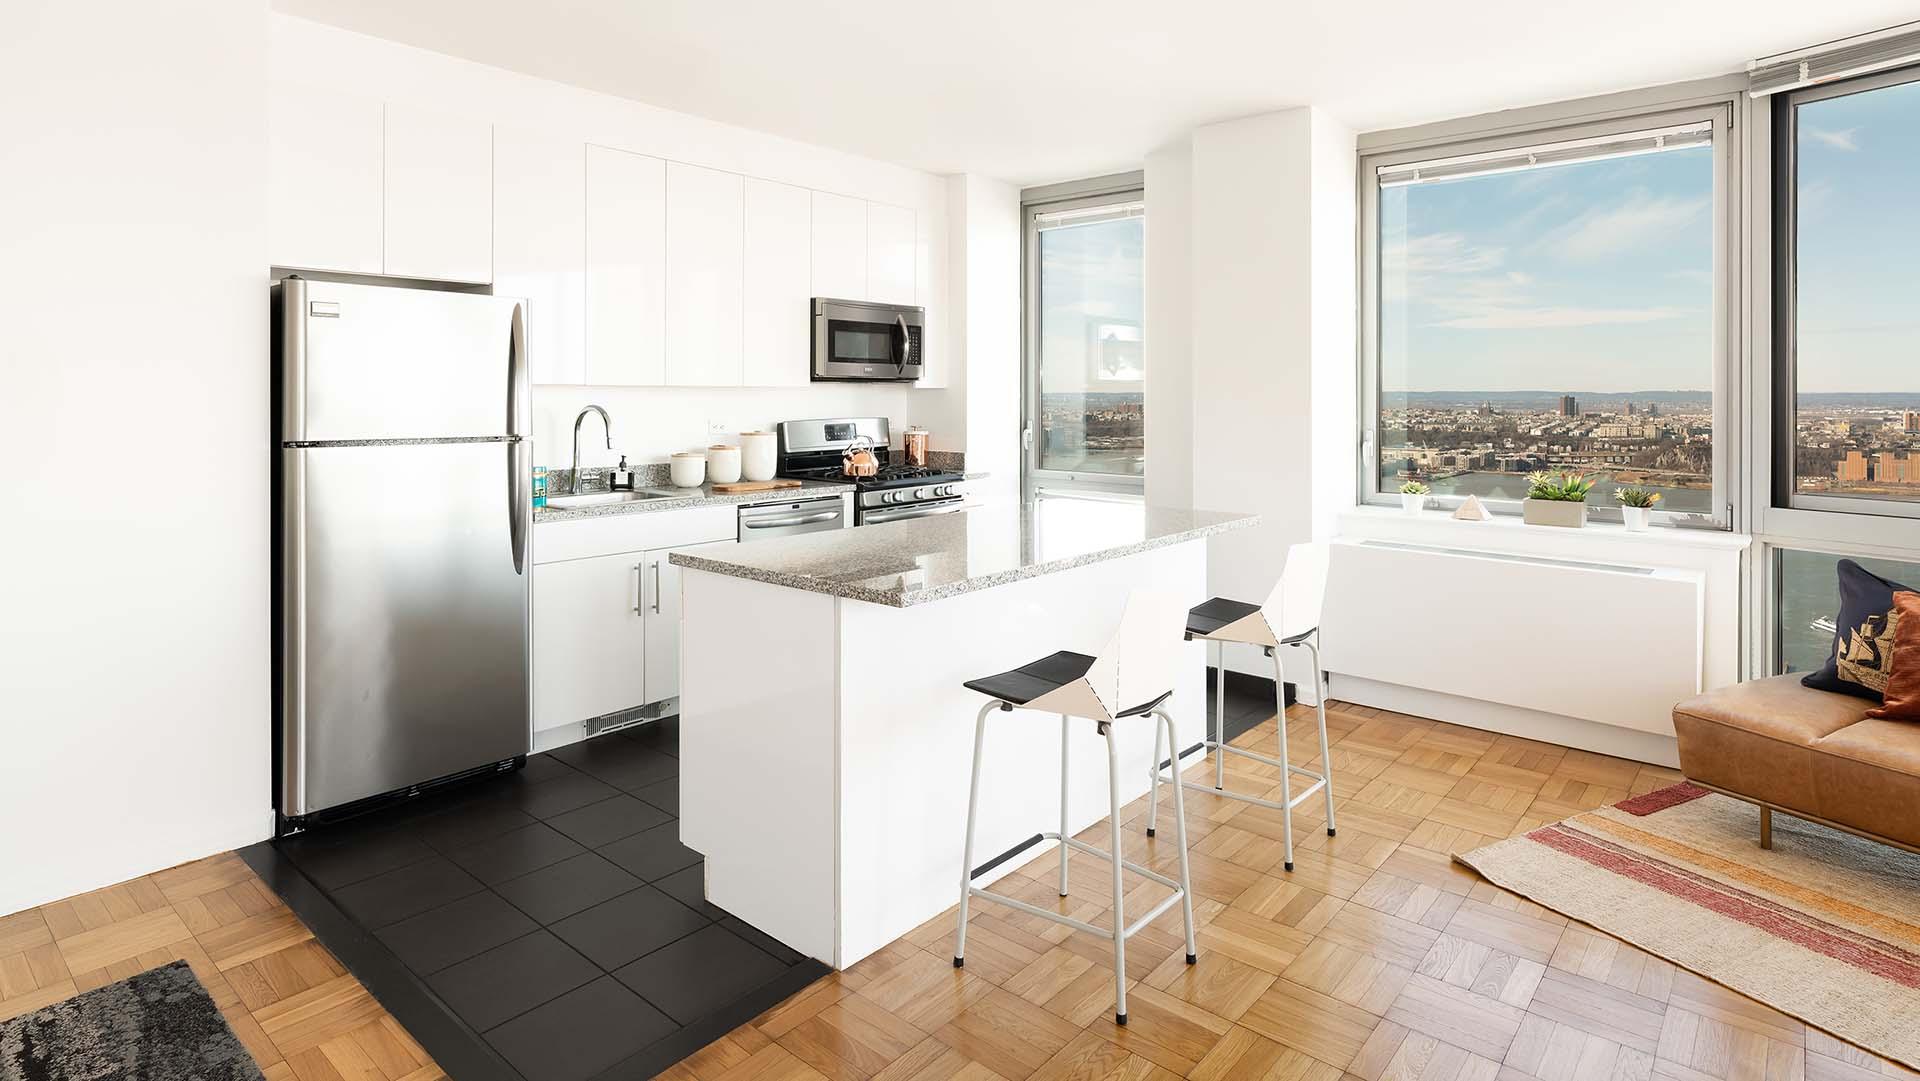 1 BathroomBathrooms,Apartment,For Rent,1015